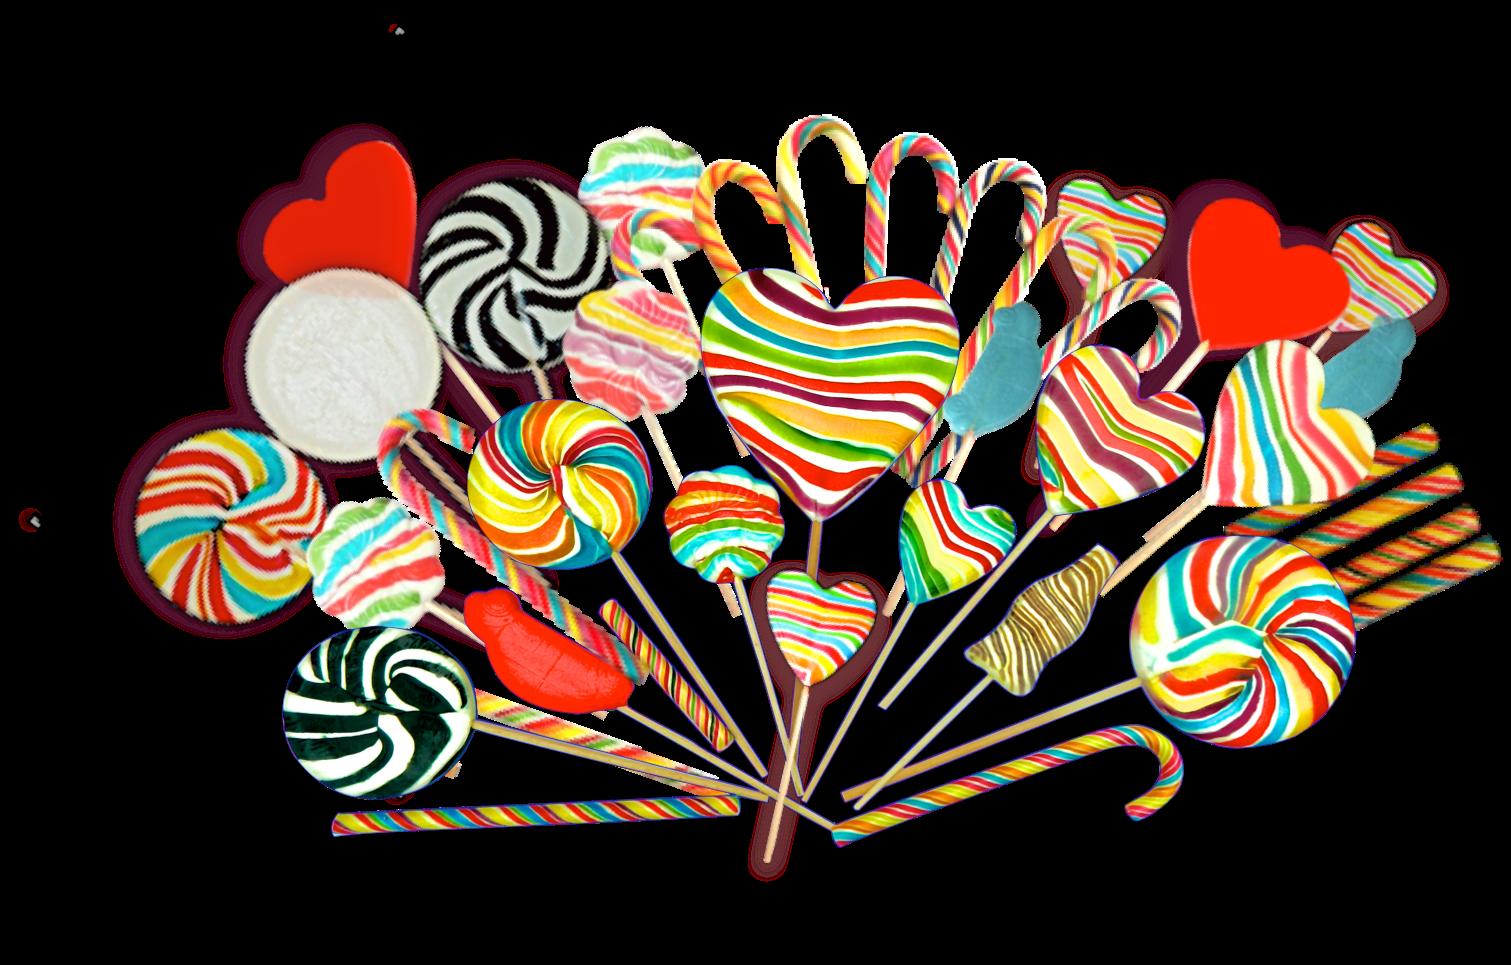 Lollipop clipart heart shaped lollipop. Lollipops and candy cane